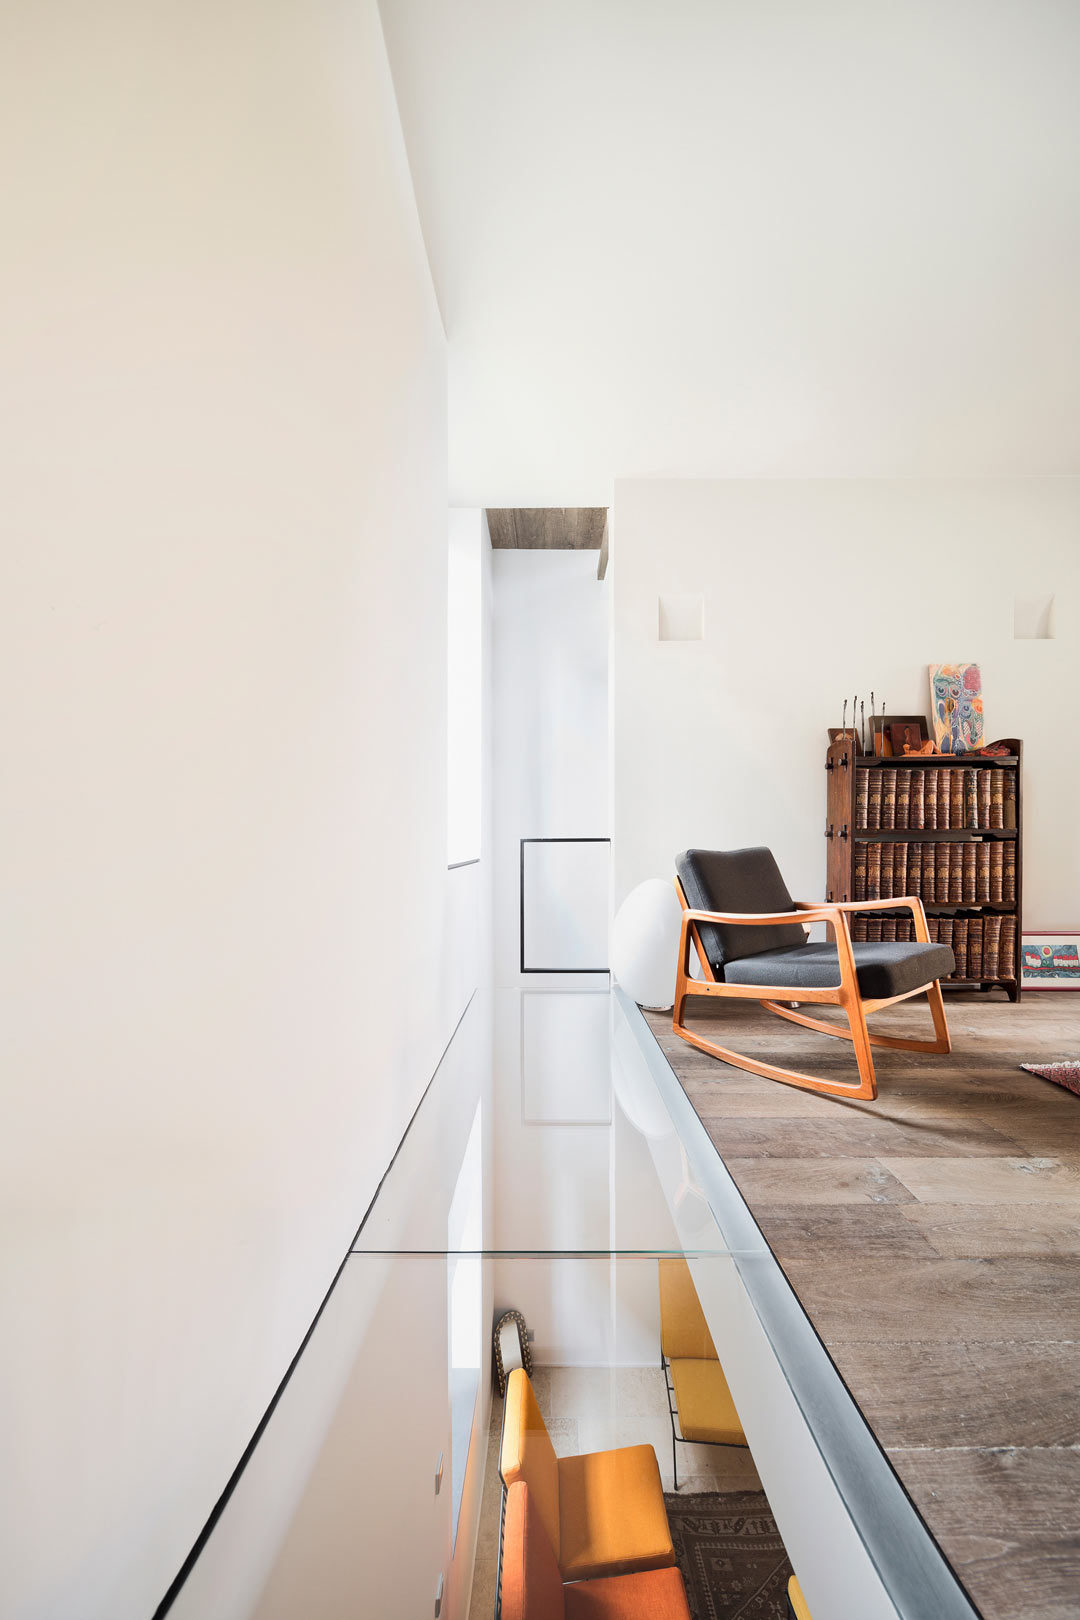 vertical-loft-westway-architects-2